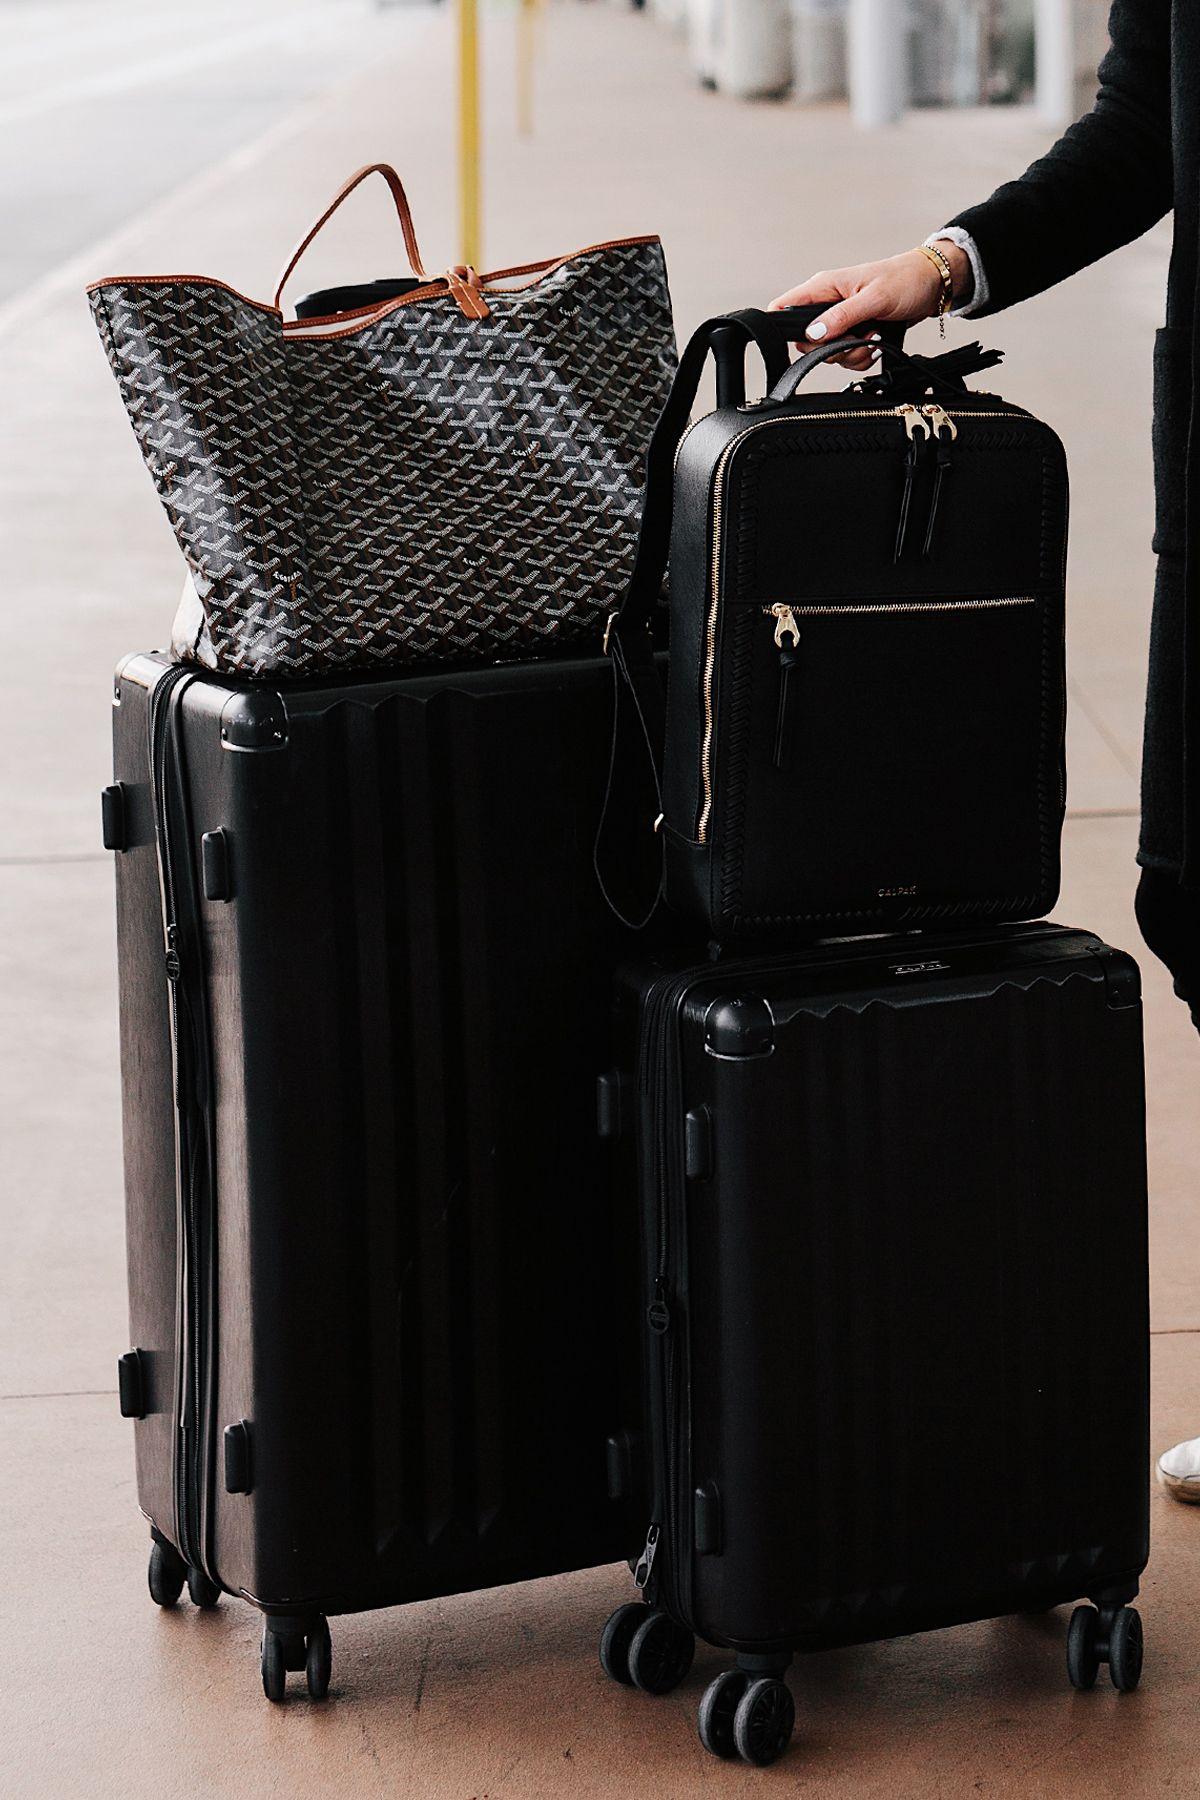 d7b105c68 Calpak Black Luggage Set Calpak Black Backpack Goyard Tote Airport Style